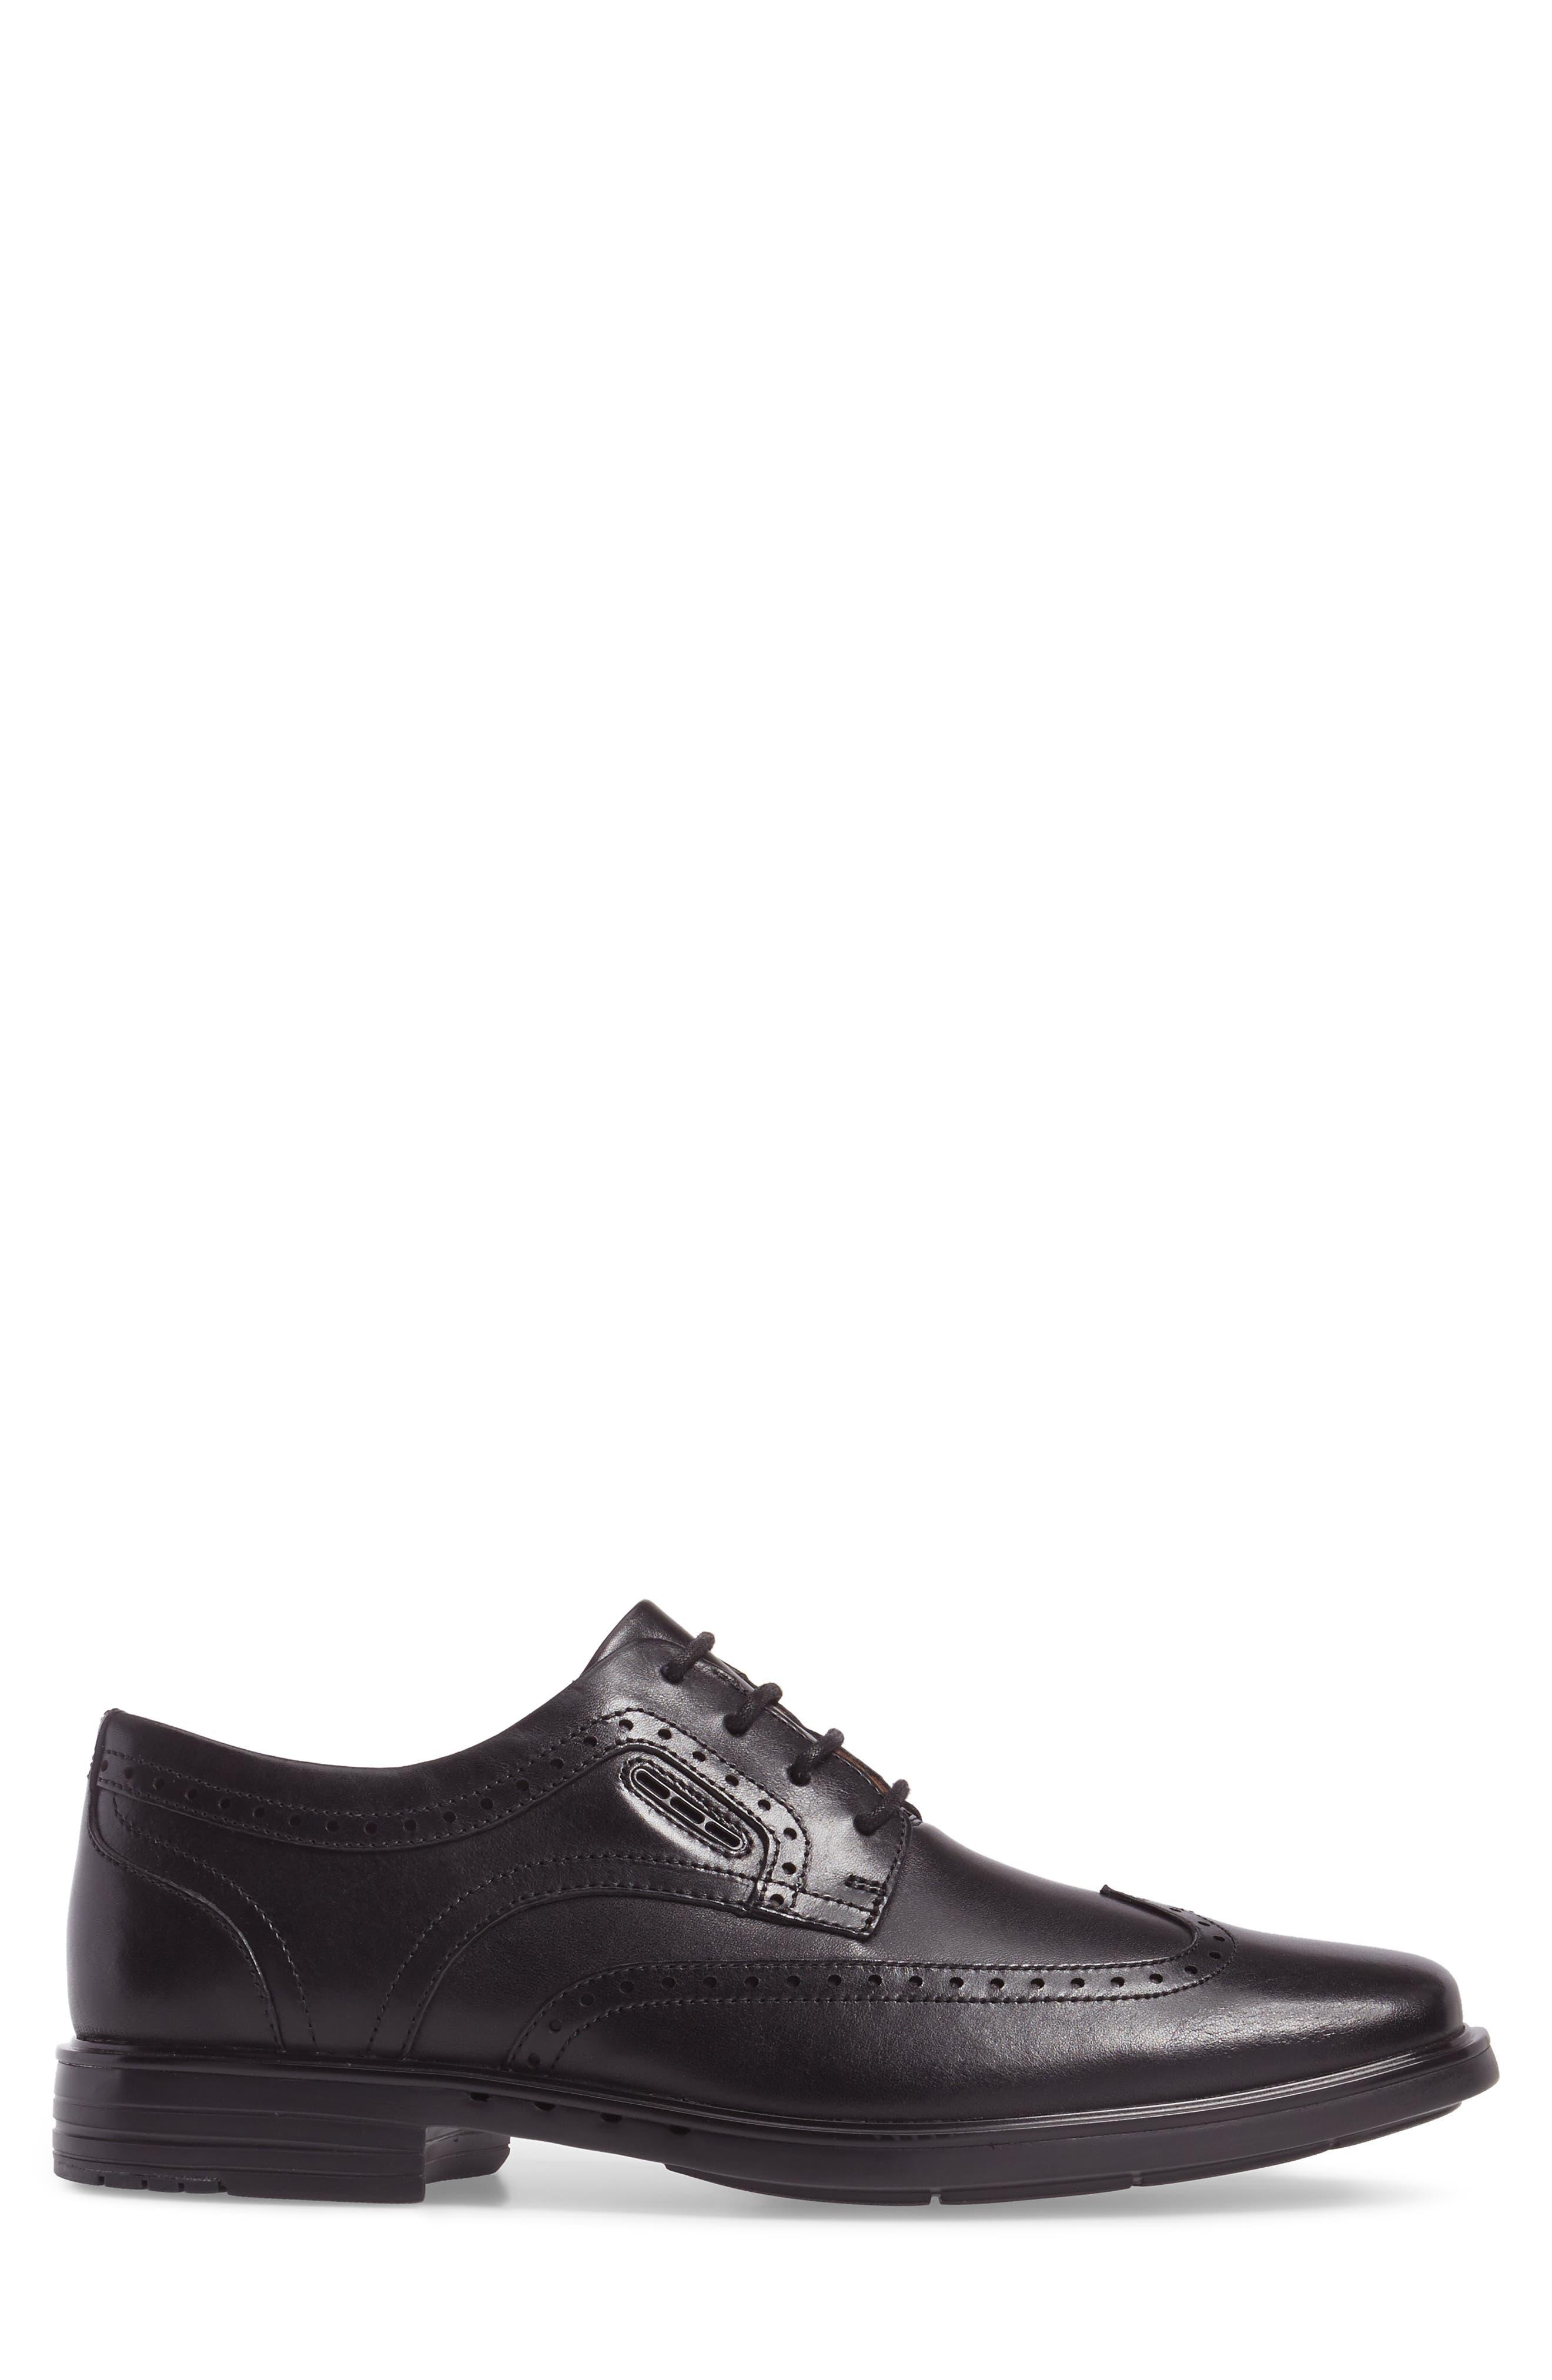 Unbrylan Wingtip Oxford,                             Alternate thumbnail 3, color,                             Black Leather